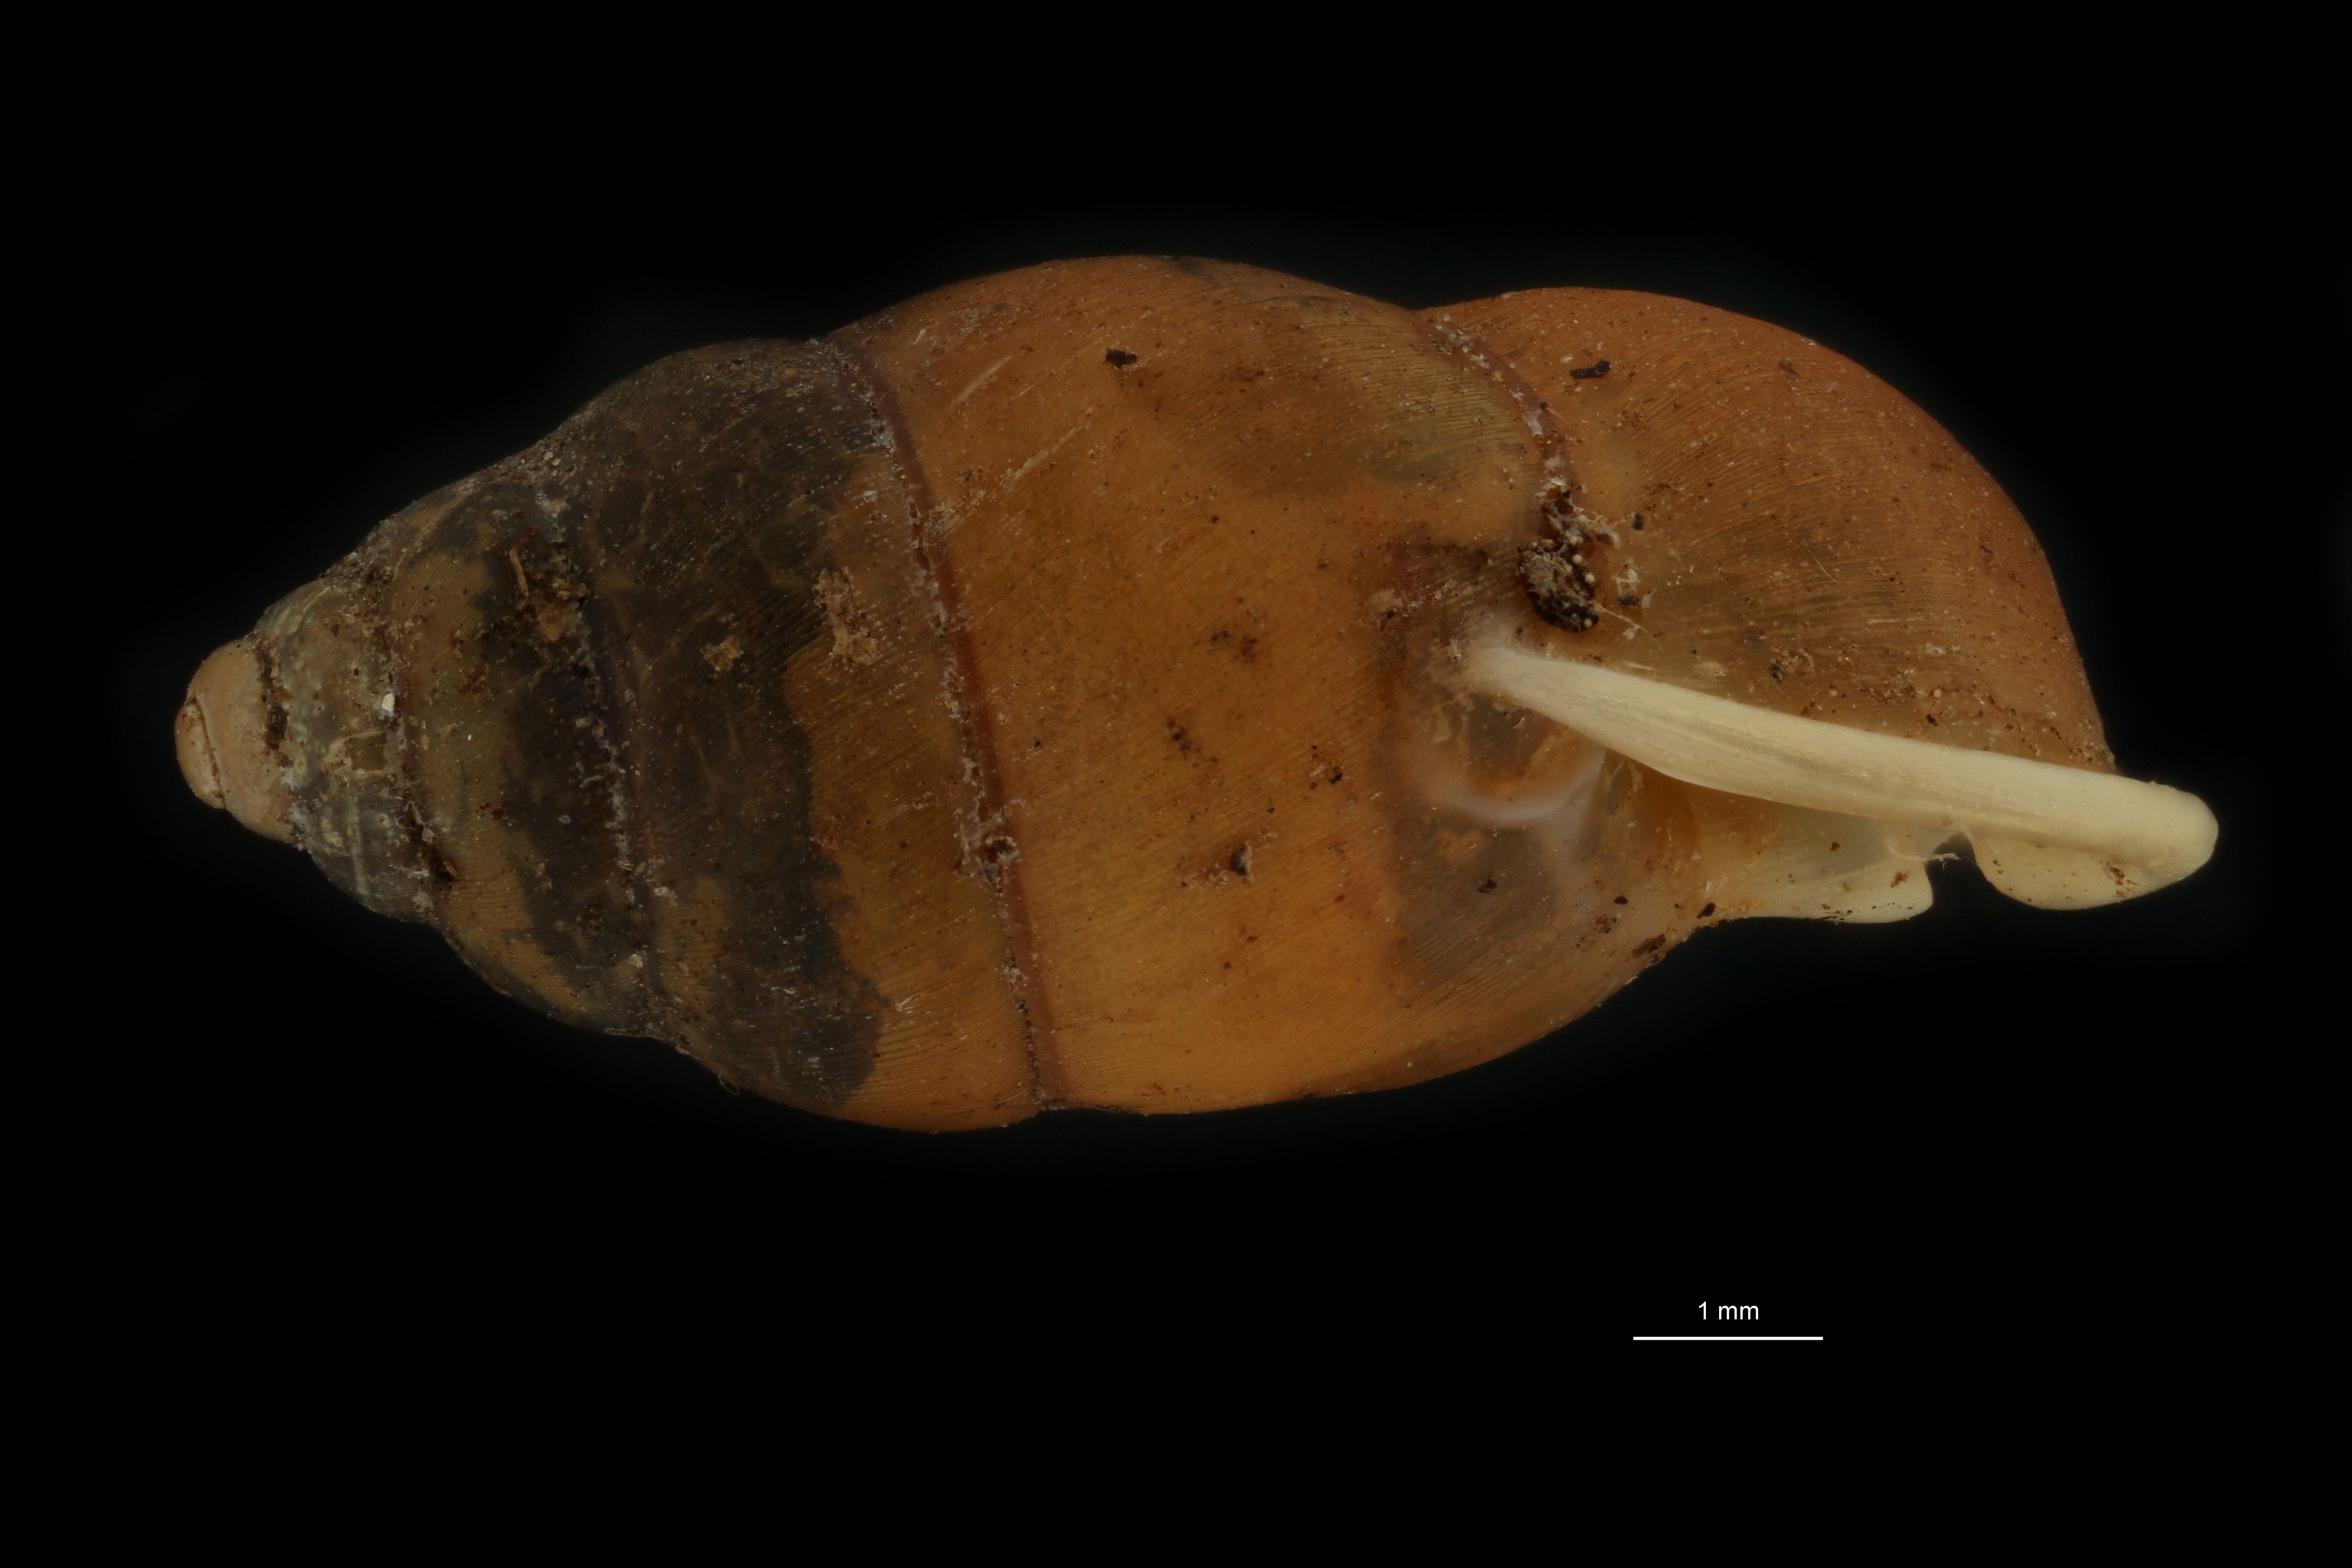 BE-RBINS-INV MT 954 Pupinella (Pupinopsis) fruhstorferi var. tsushimana pt L.jpg